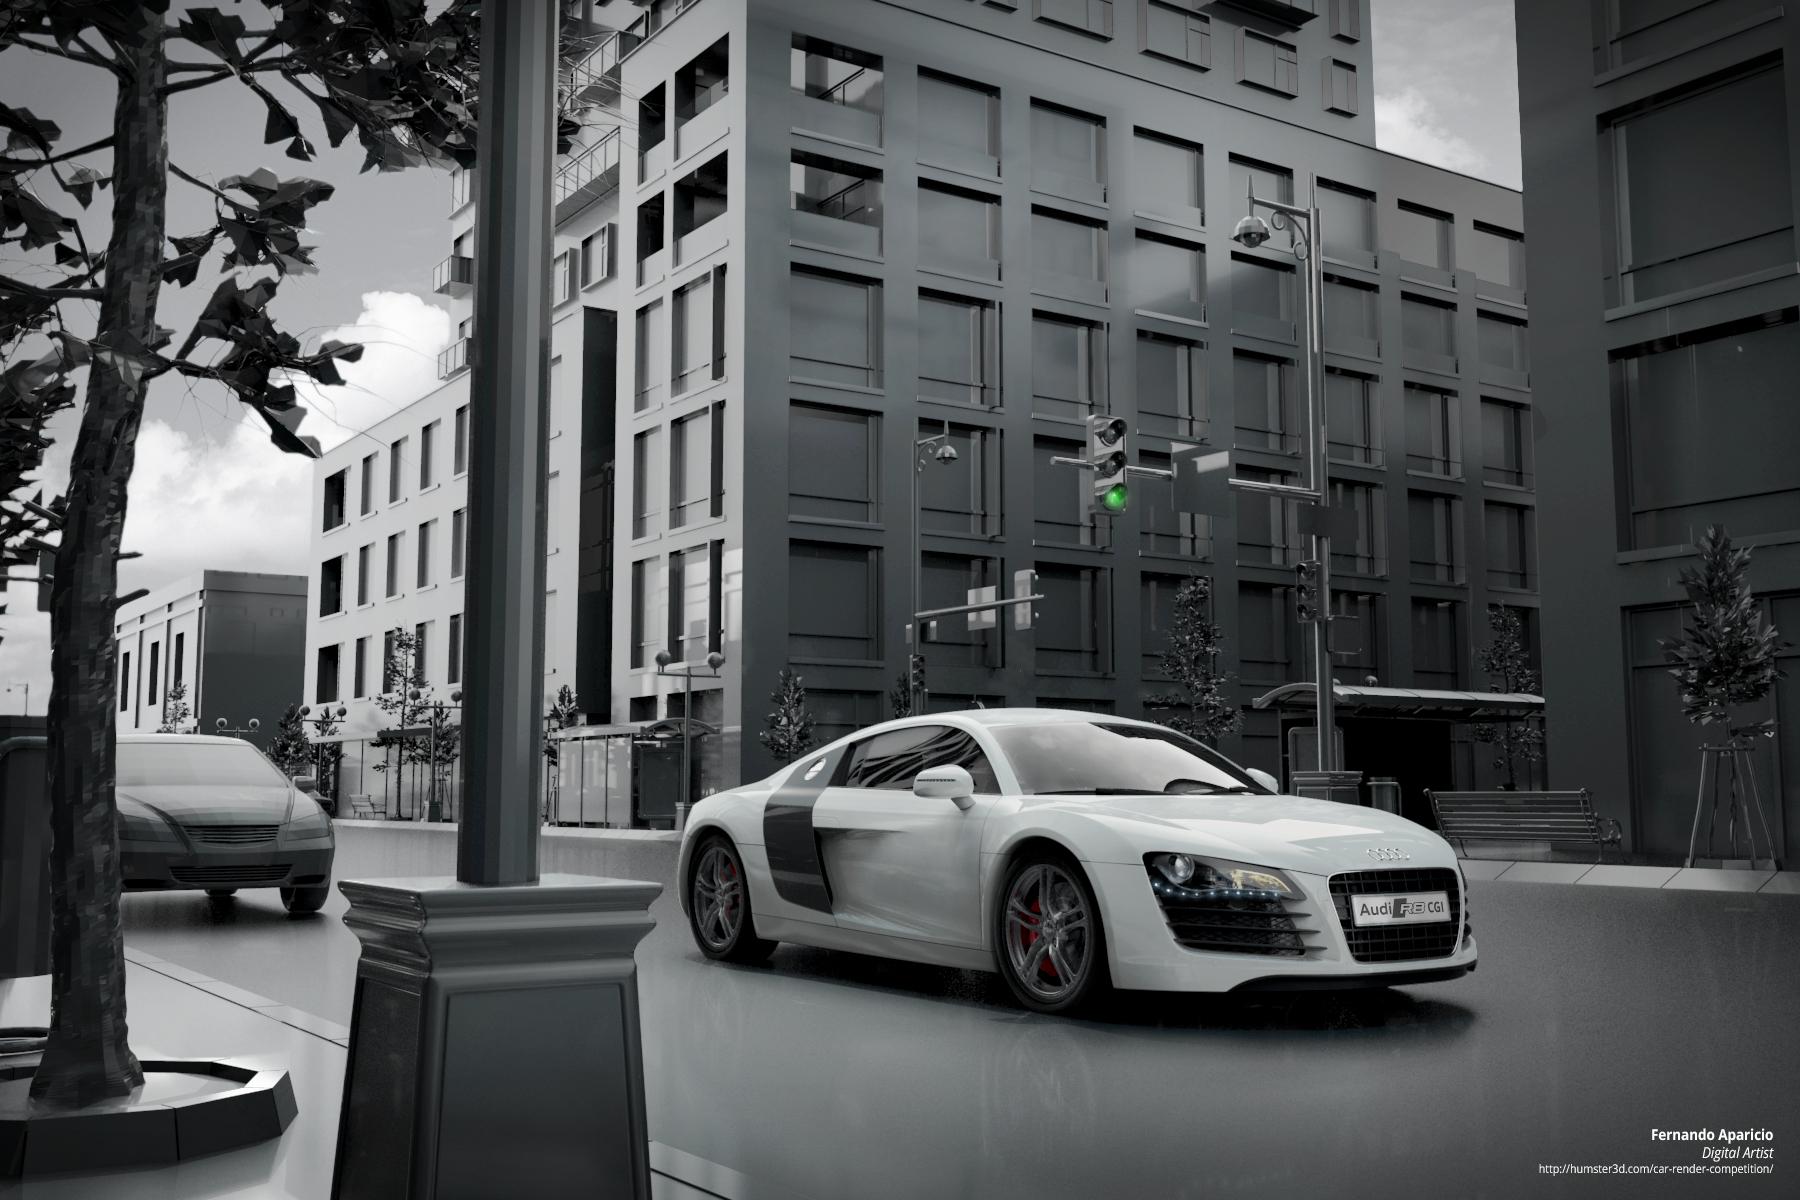 Audi R8 CGI 3d art